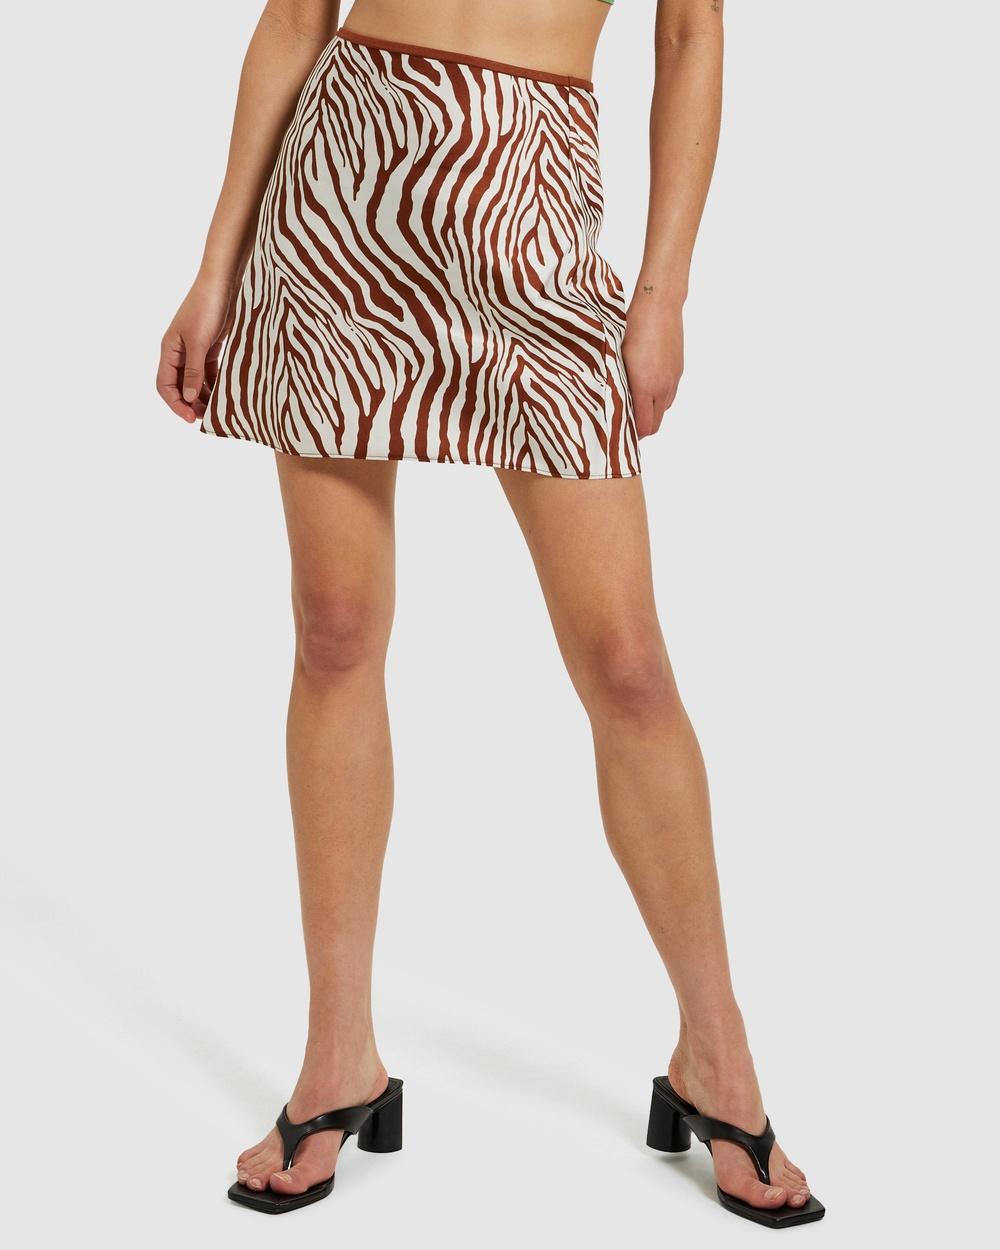 Alice In The Eve Cleo Zebra Slip Mini Skirt Skirts ASSORTED